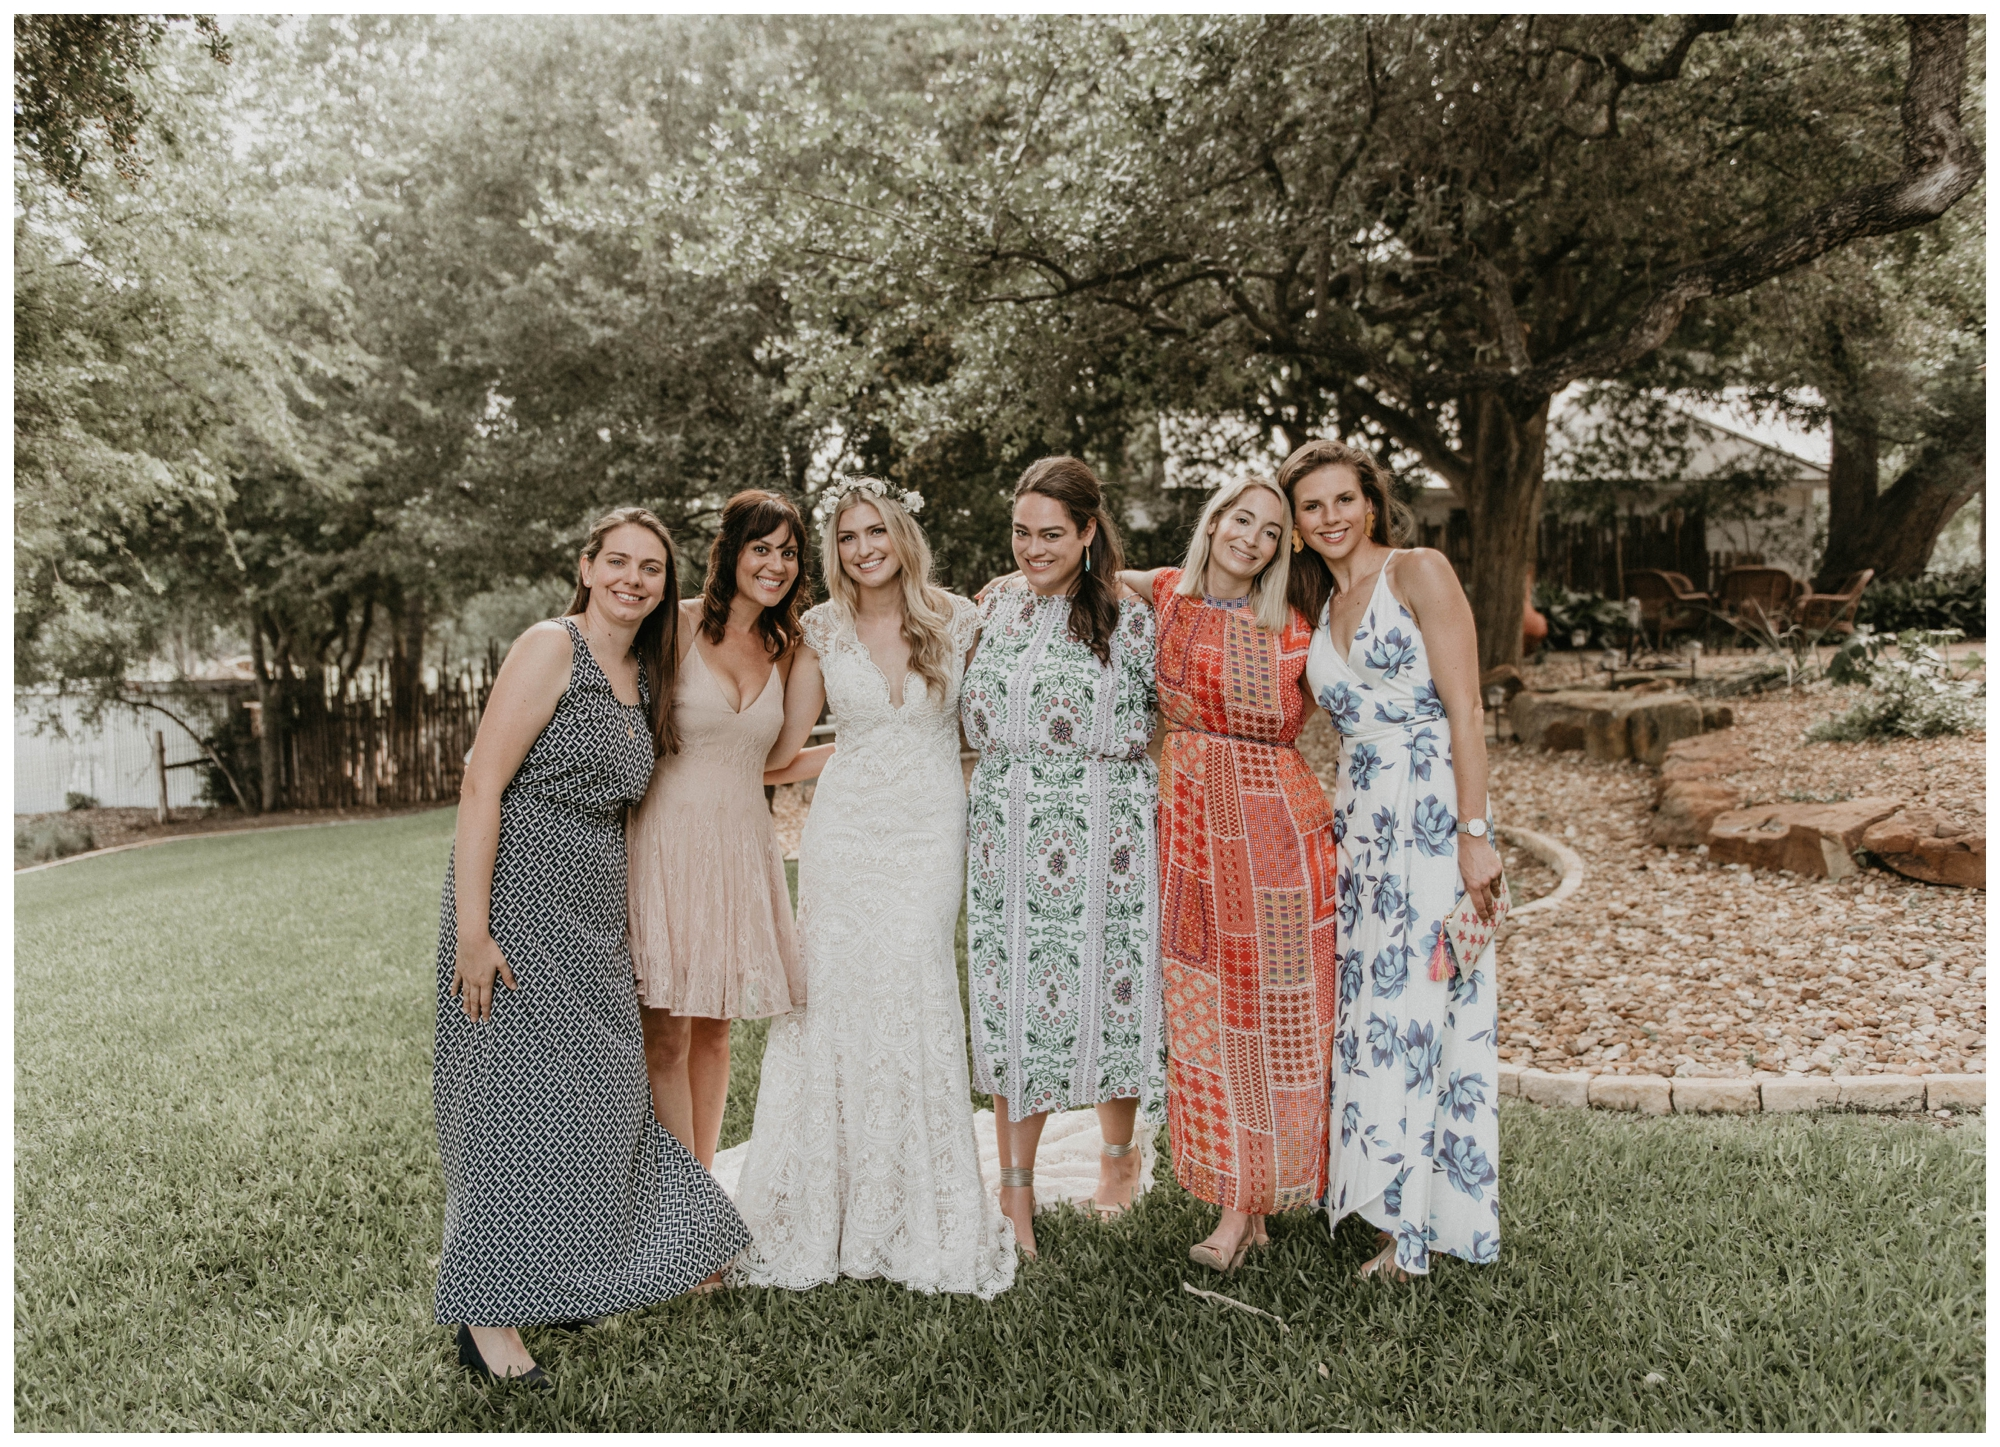 austin-texas-wedding-photography-1778-photographie_0062.jpg